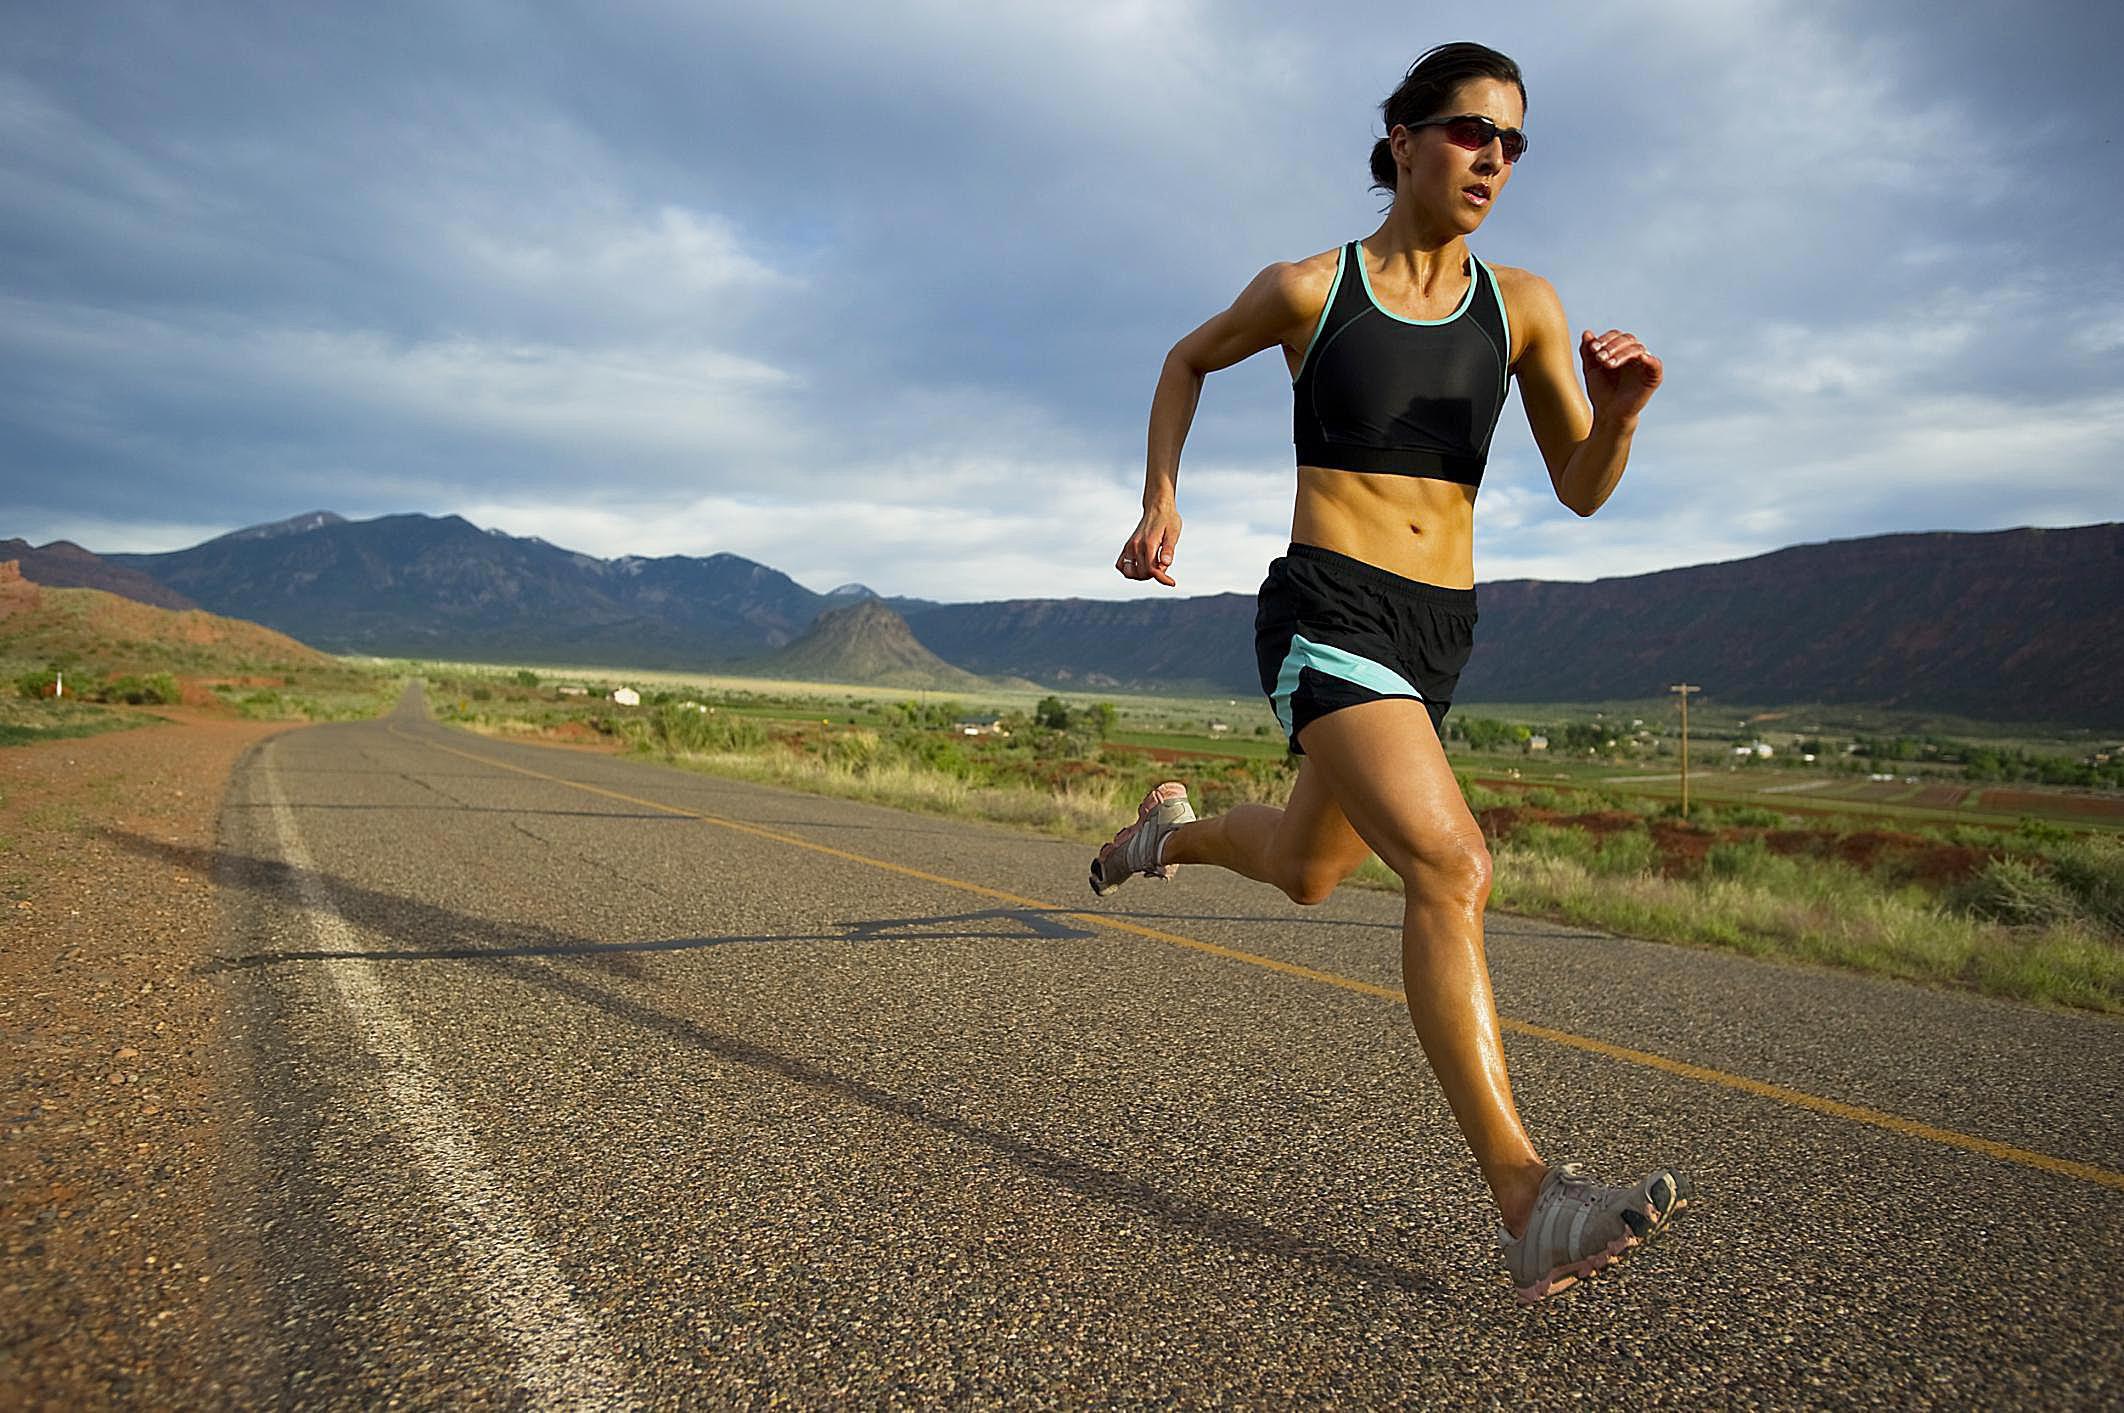 How to Breathe When Running | POPSUGAR Fitness